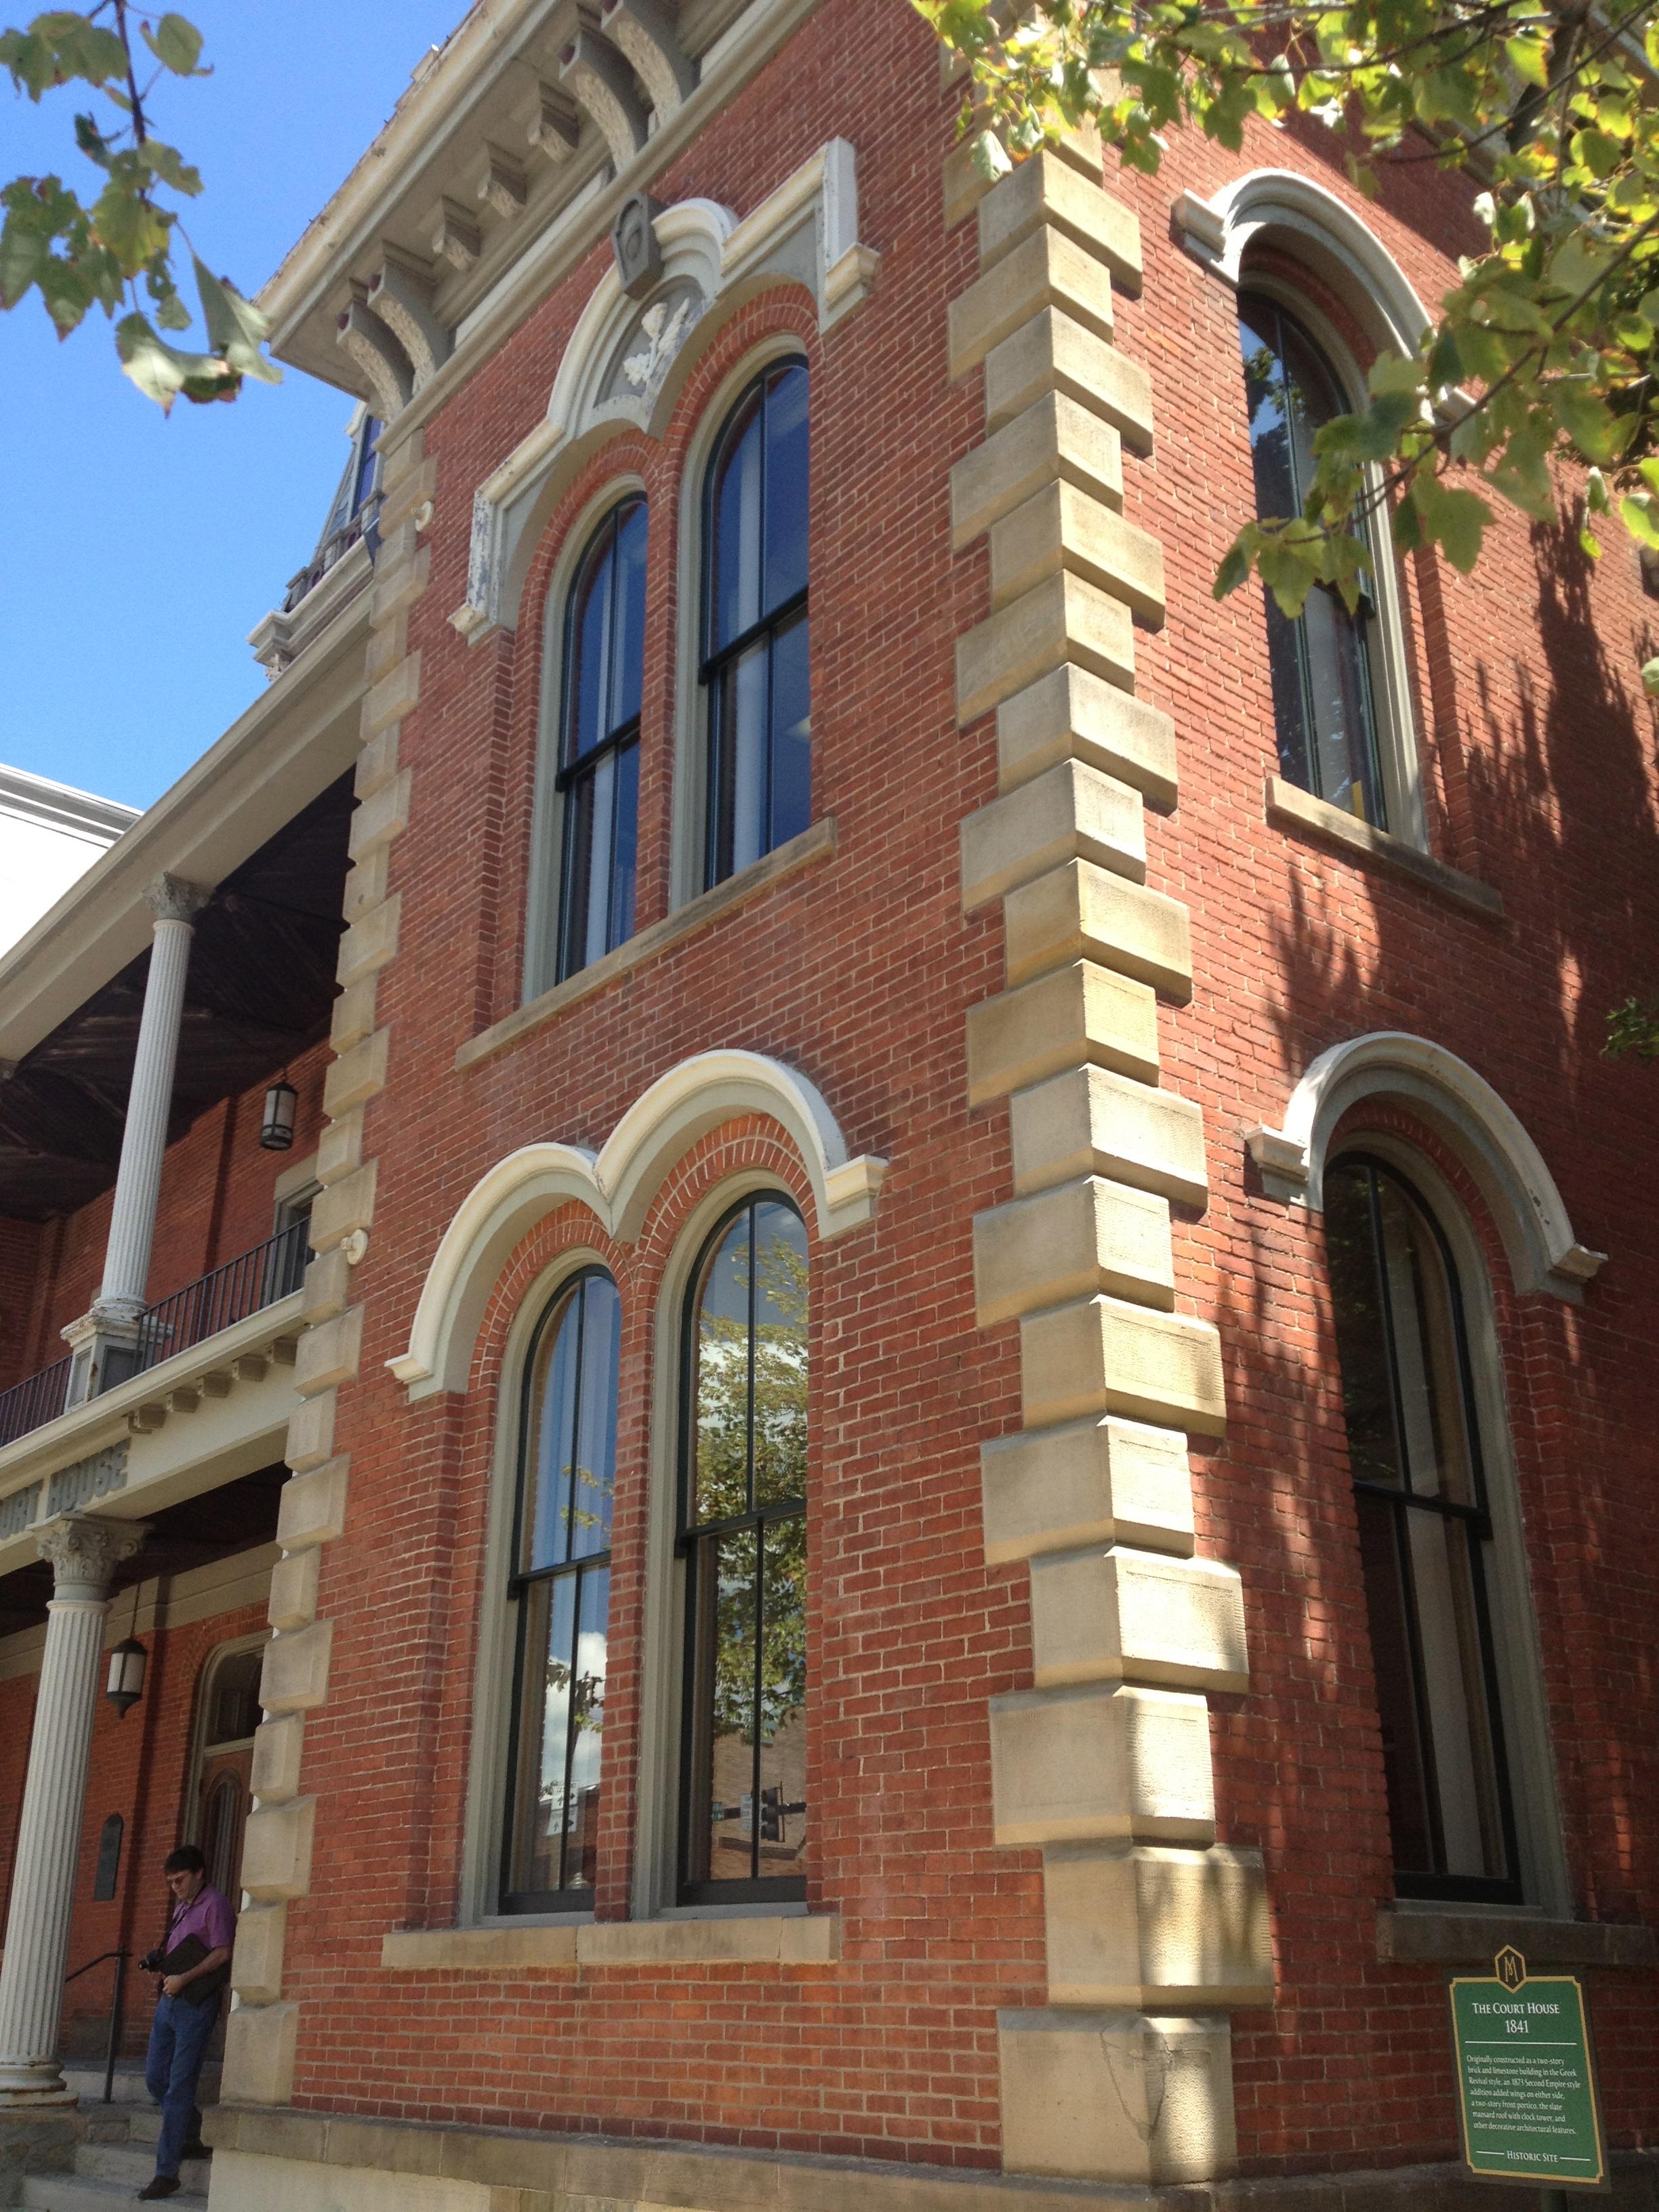 Medina County Court House